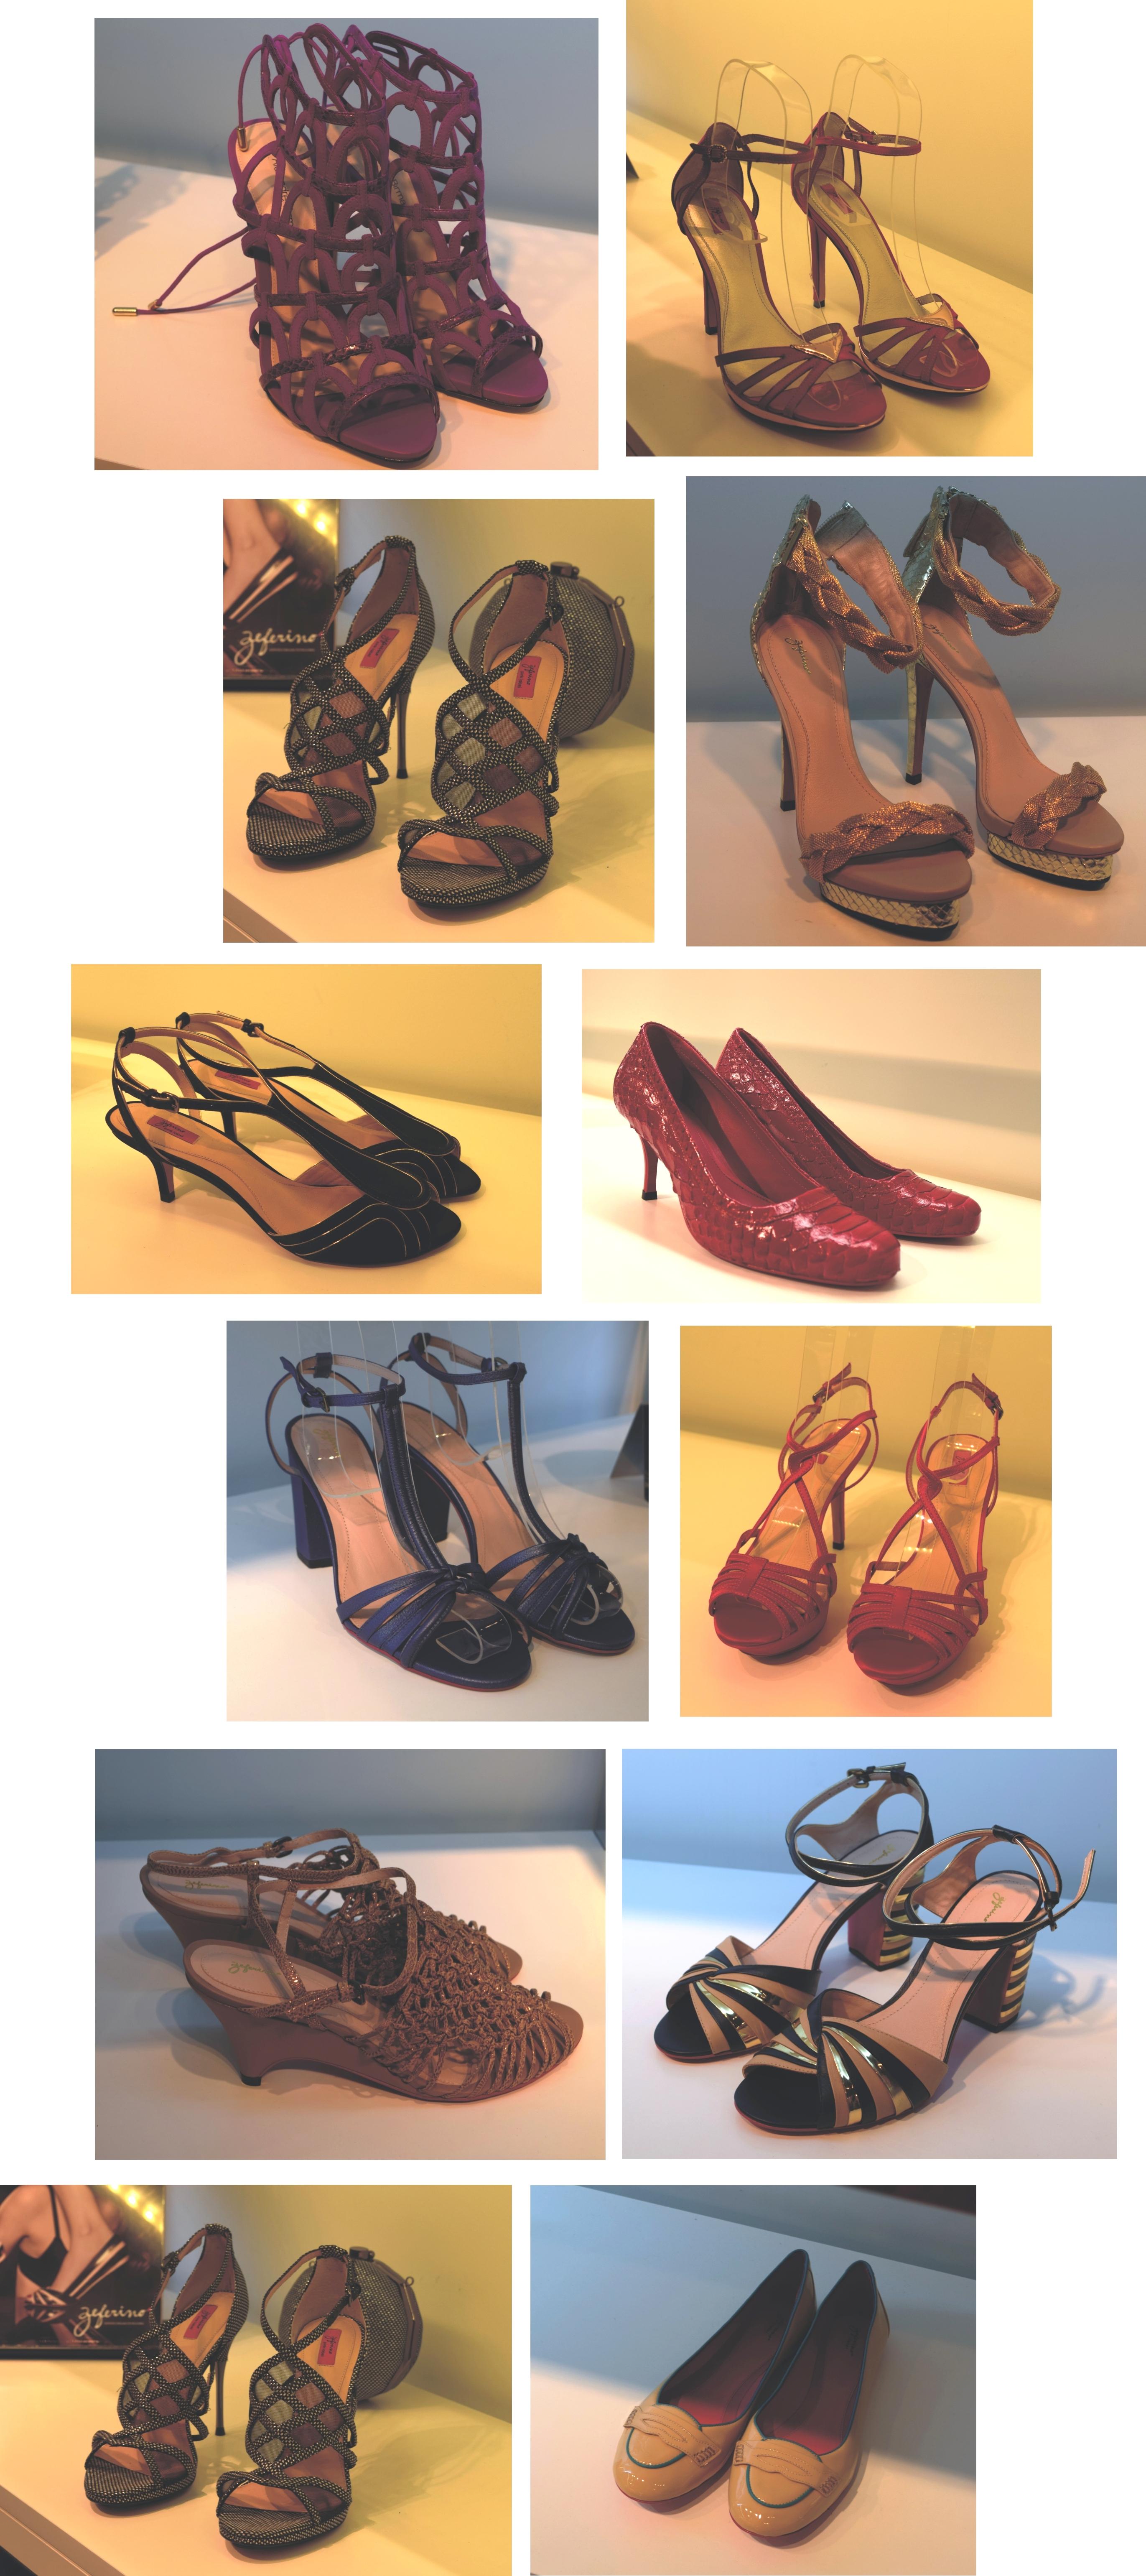 Sapatos _ Zeferino _ Arianne Ribeiro